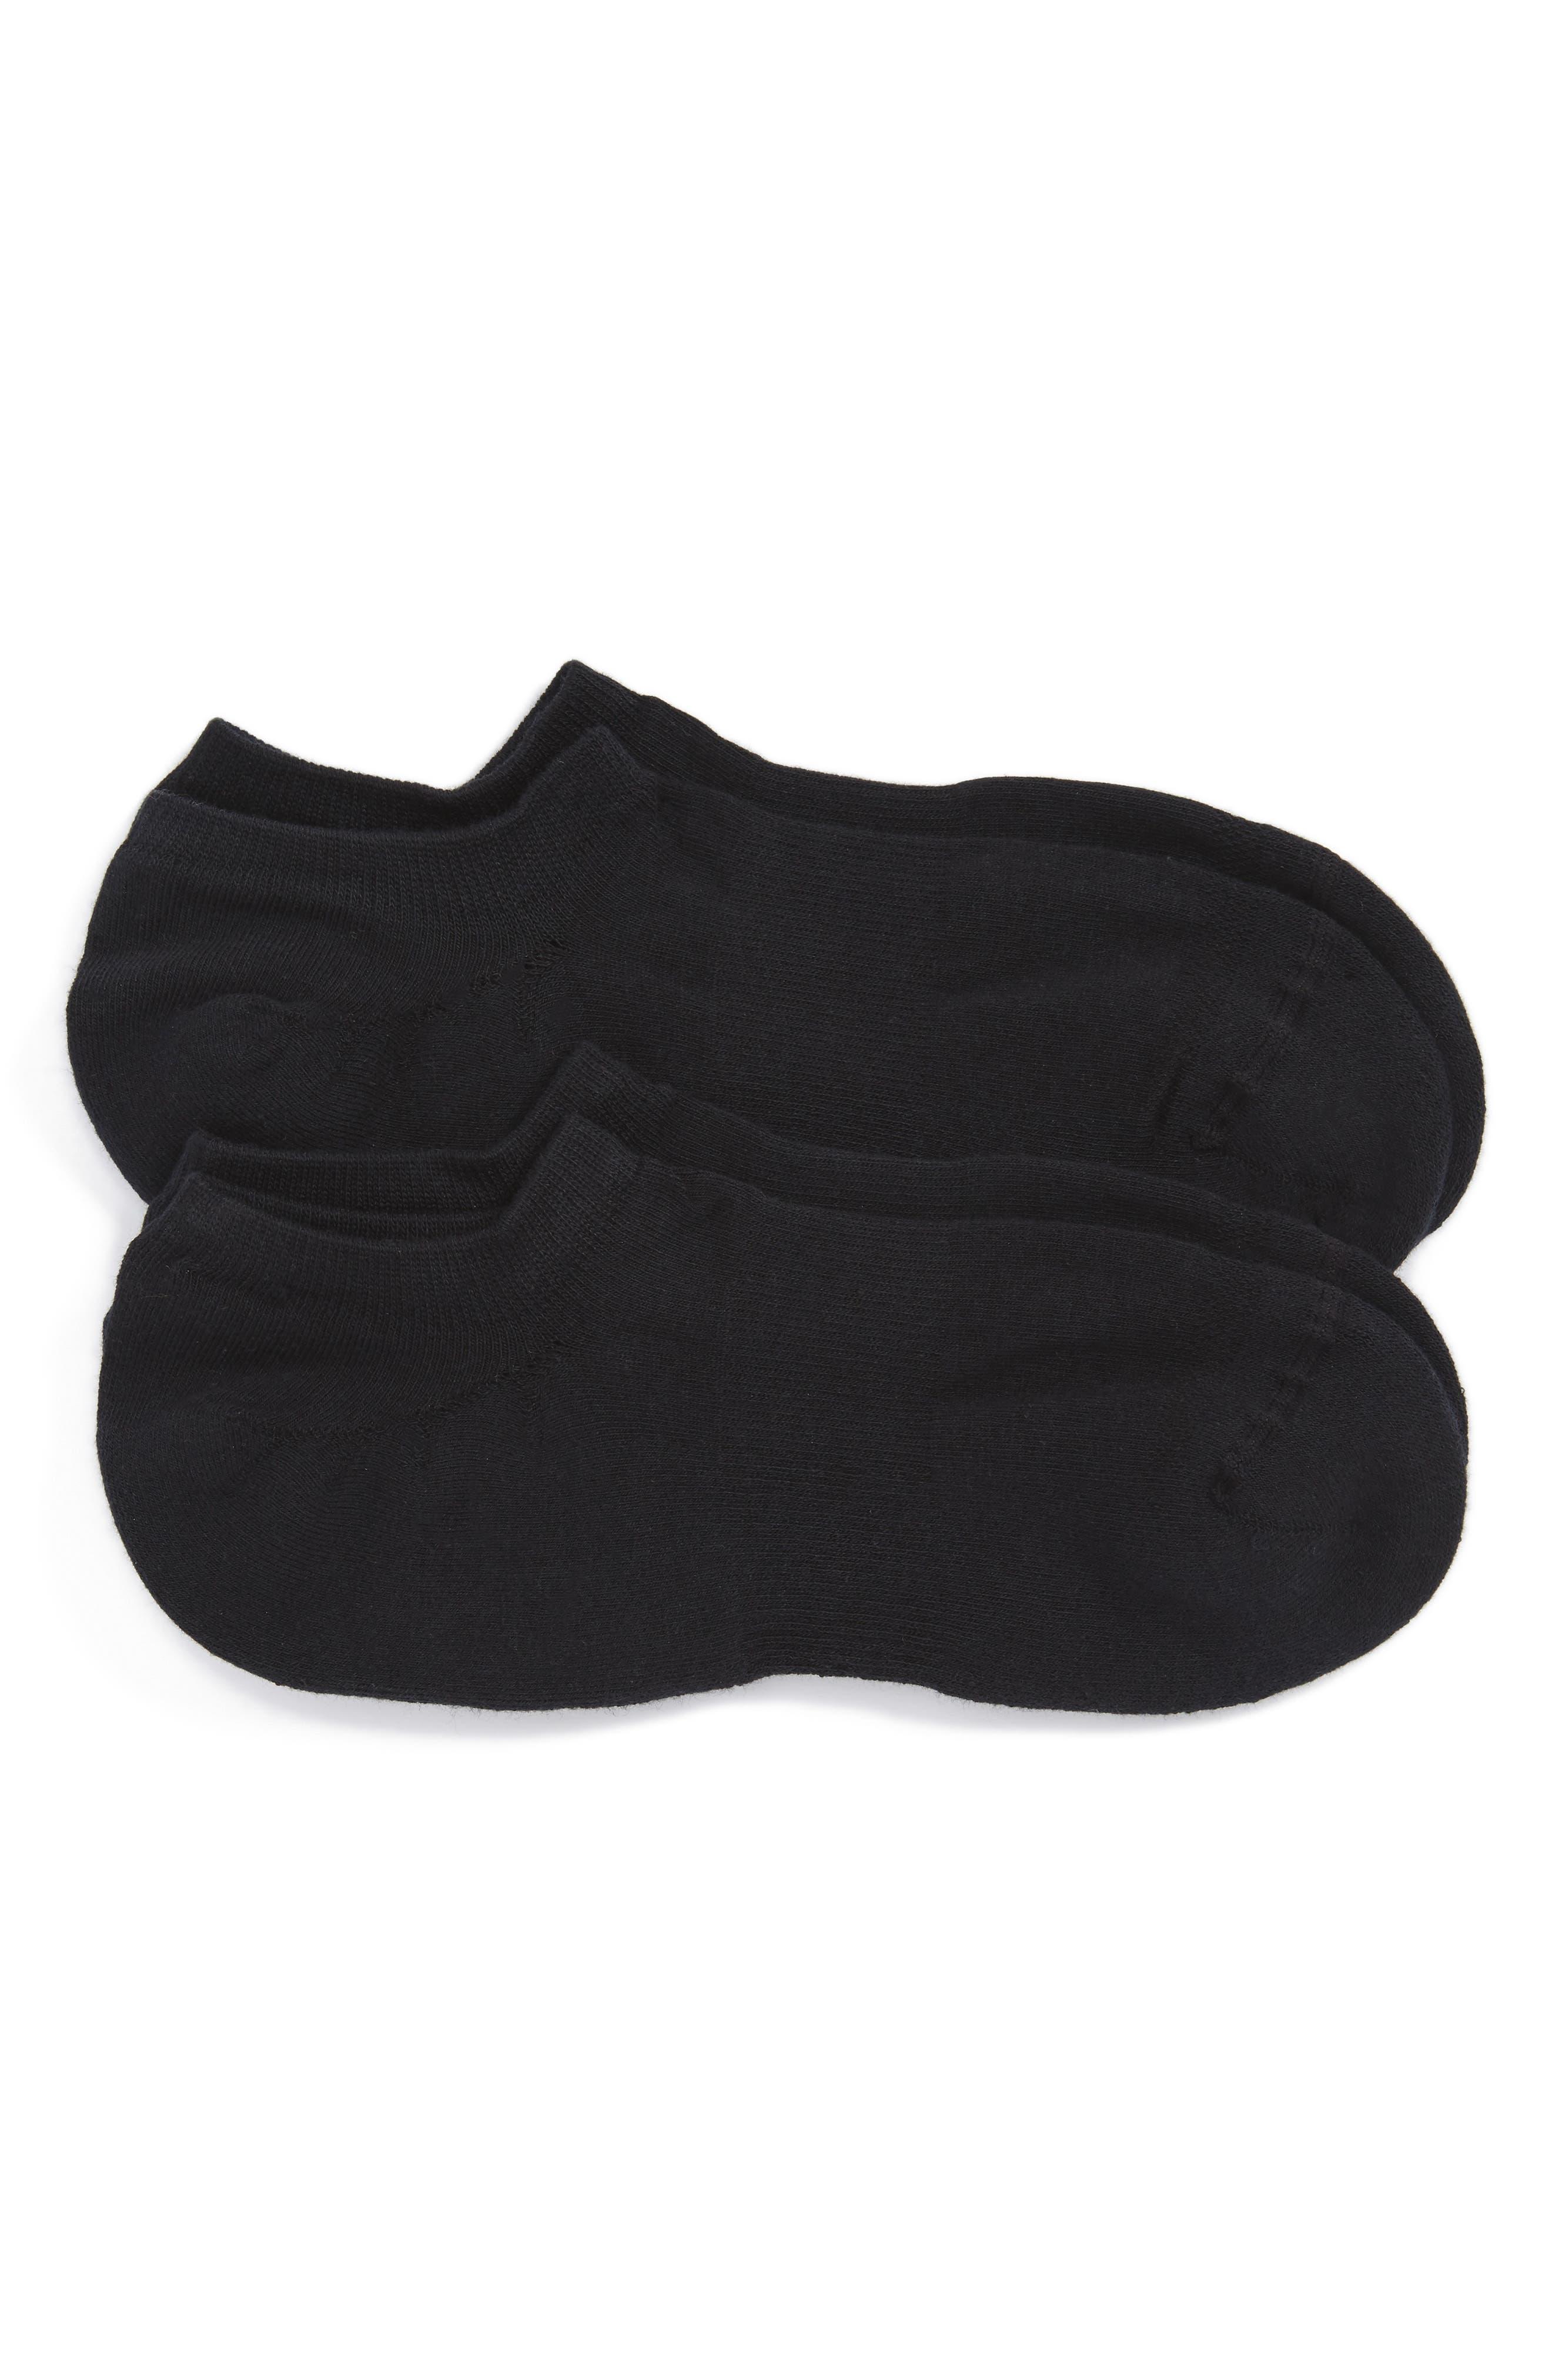 2-Pack Sneaker Liner Socks,                         Main,                         color, Black